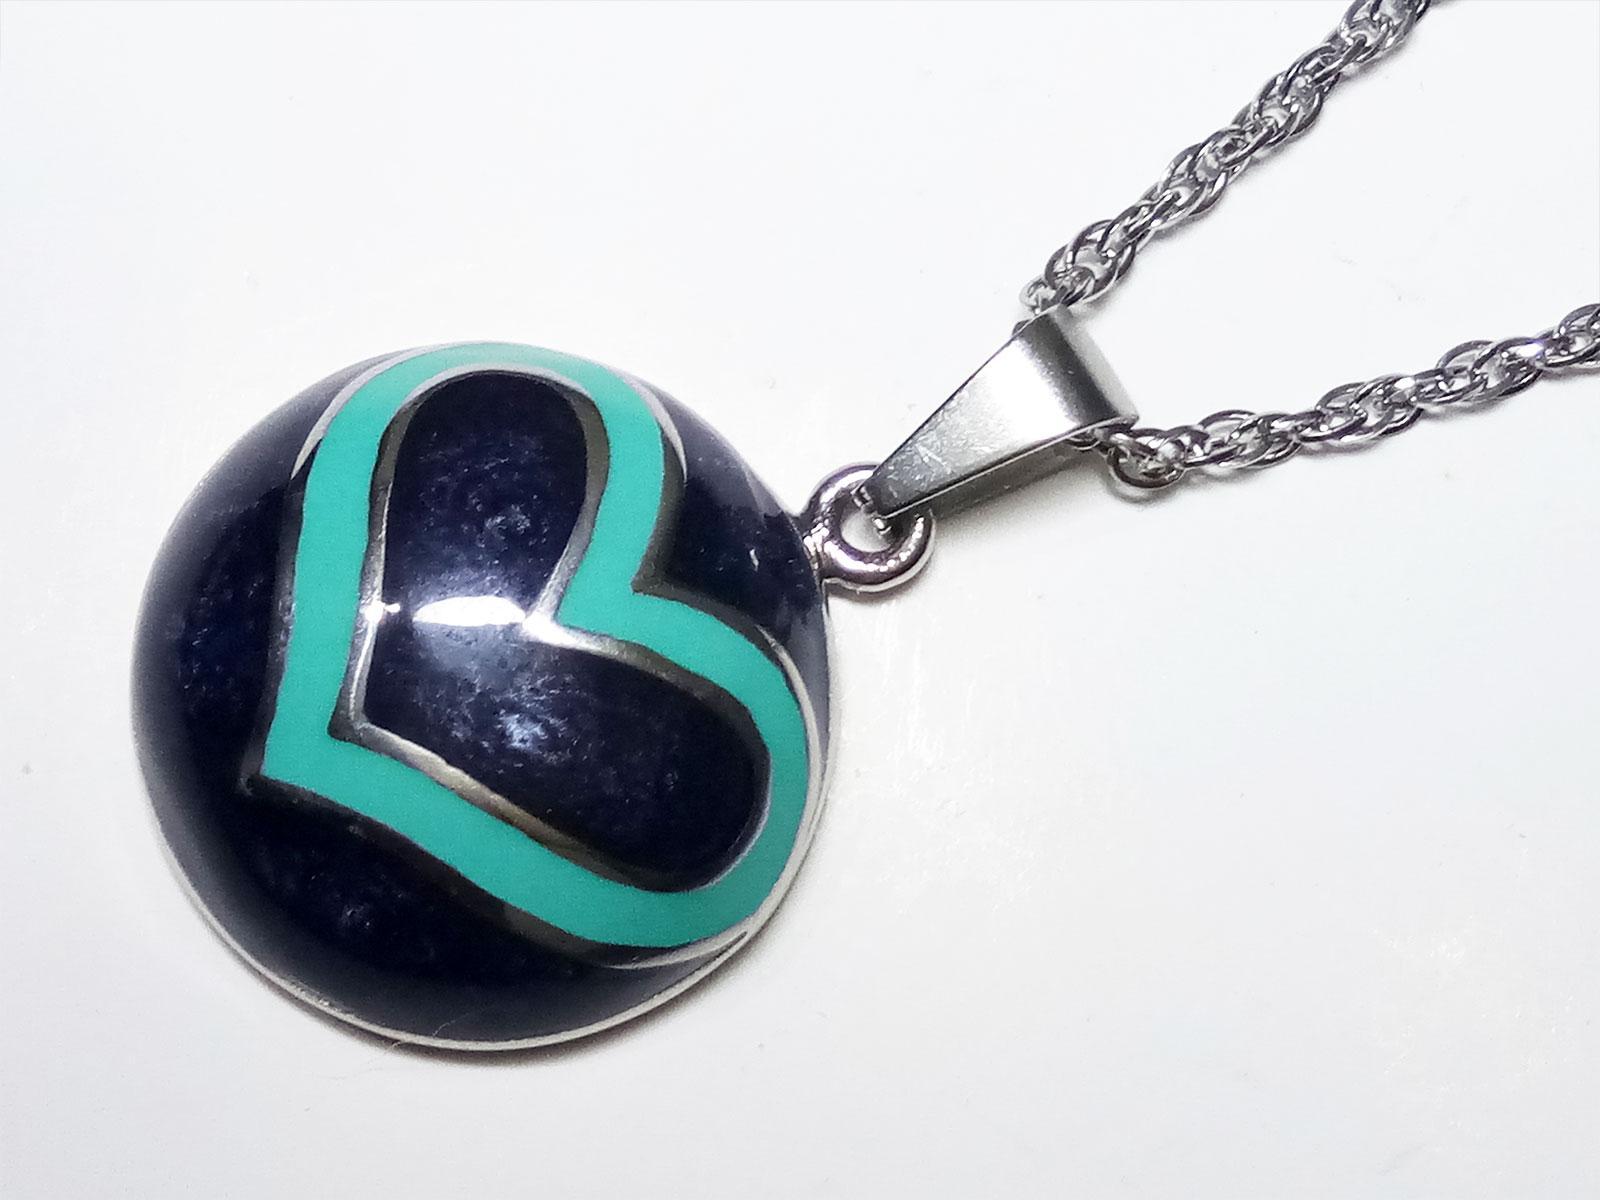 VeE Liontin Titanium Batu Bacan Cina Biru Bulat Love - Terapi Kesehatan